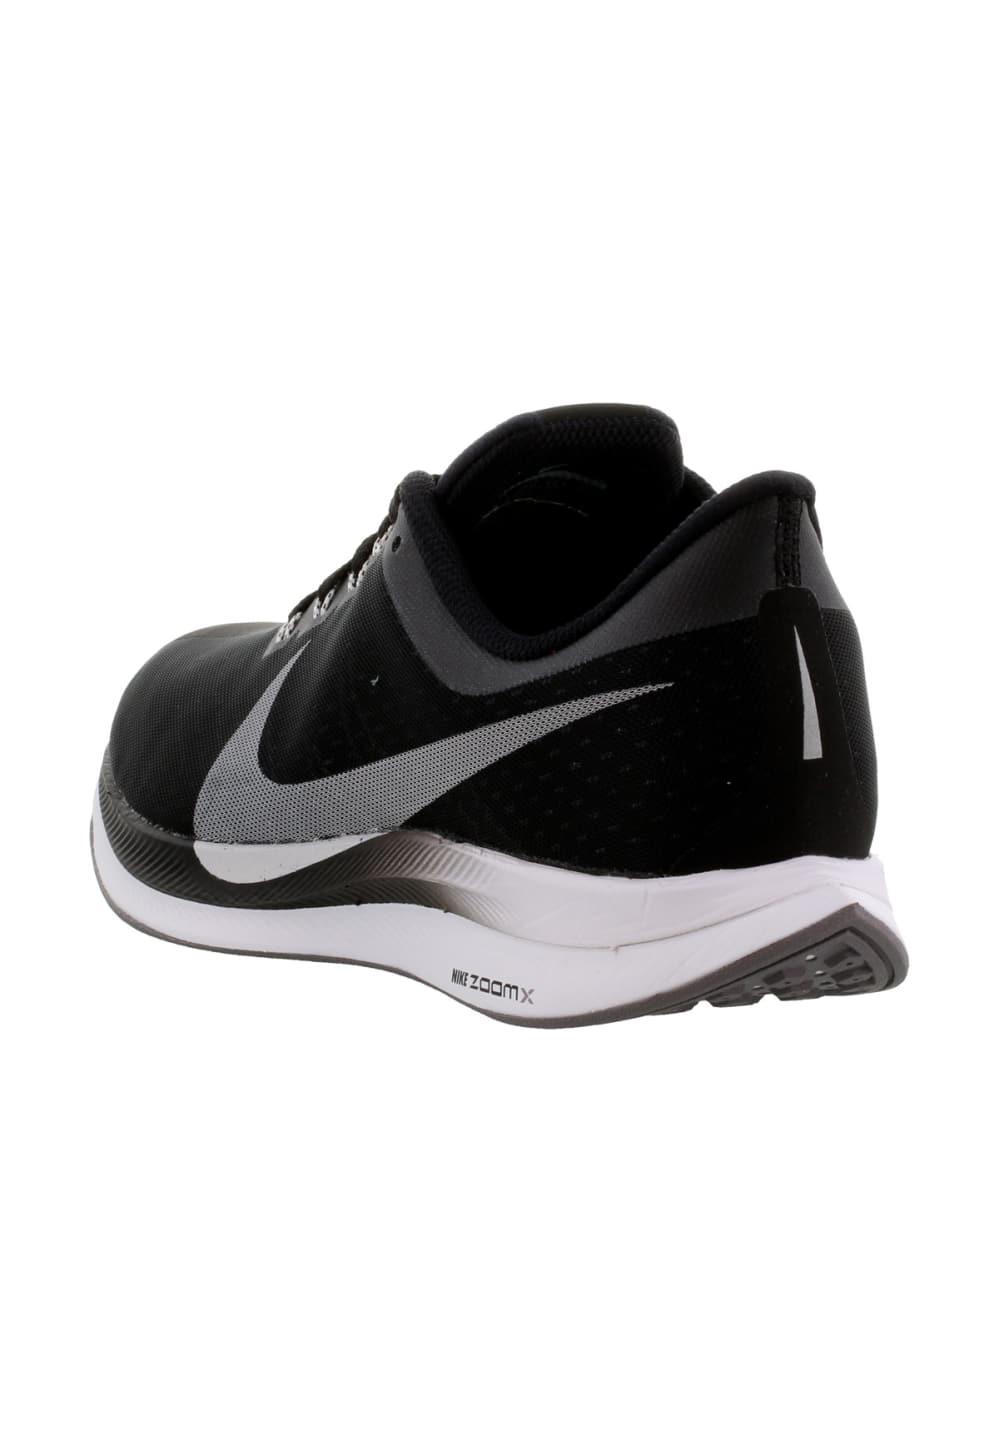 9f3c94d zapatillas running hombre mujer zoom pegasus turbo